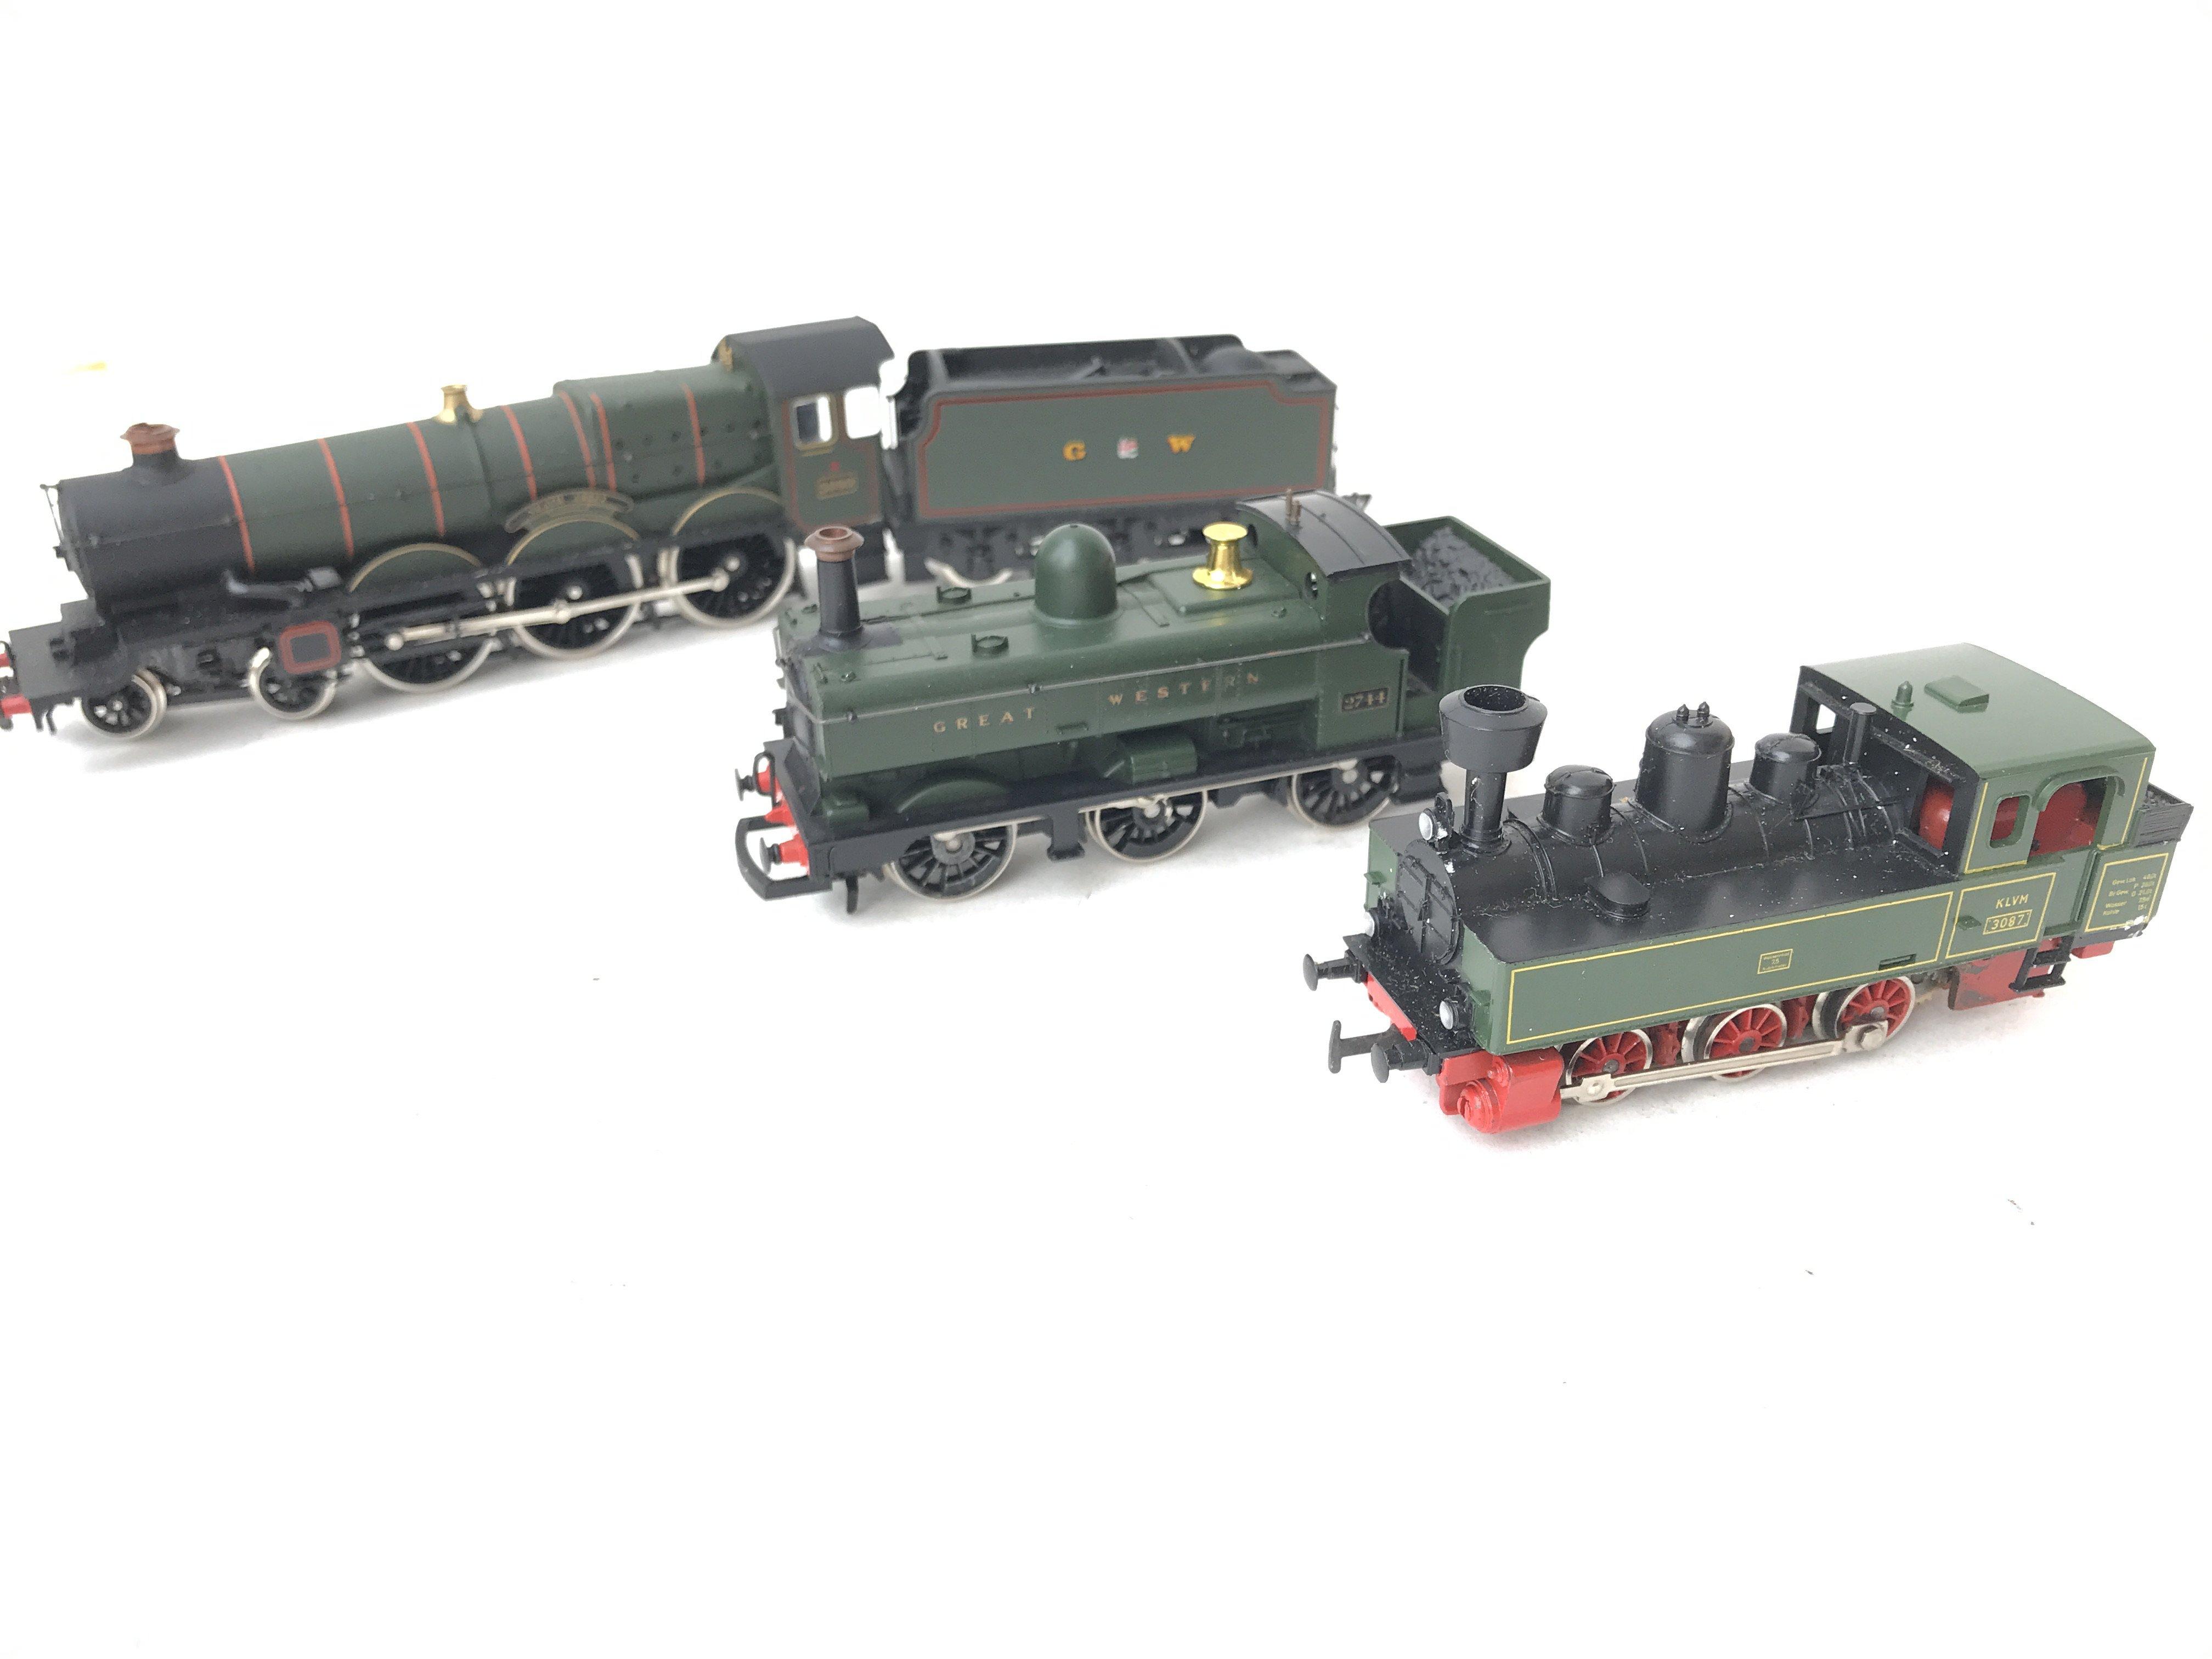 2 X 00 Gauge Locomotives including 0-6-0 Pannier tank. A Dapol GWR Castle Class Neath Abbey and a HO